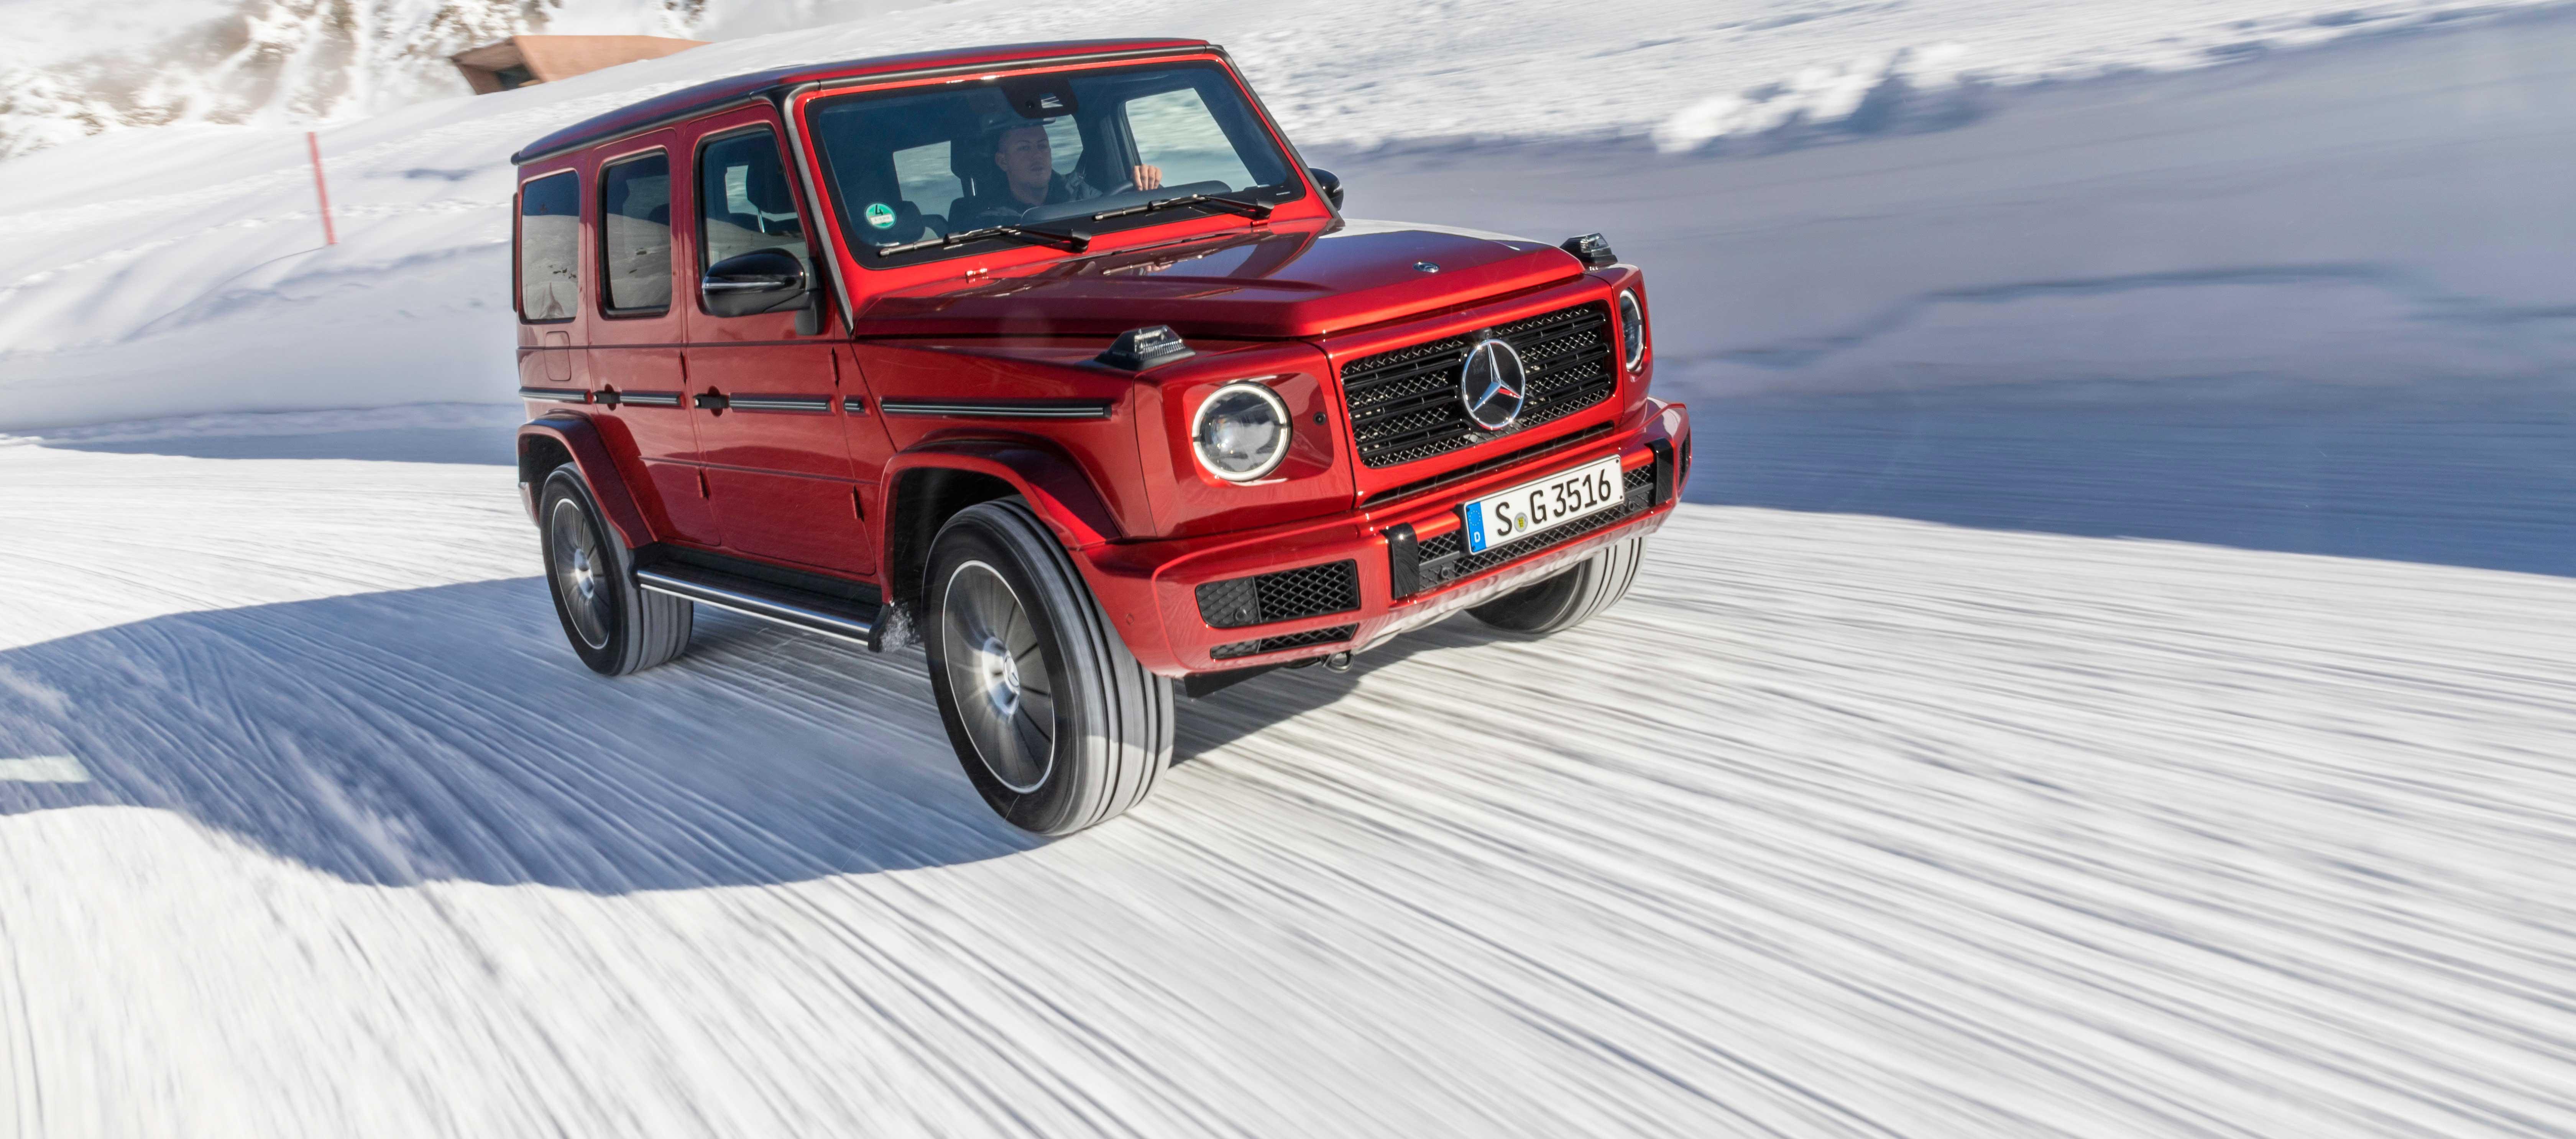 Mercedes-Benz Clase G 350d ya admite pedidos